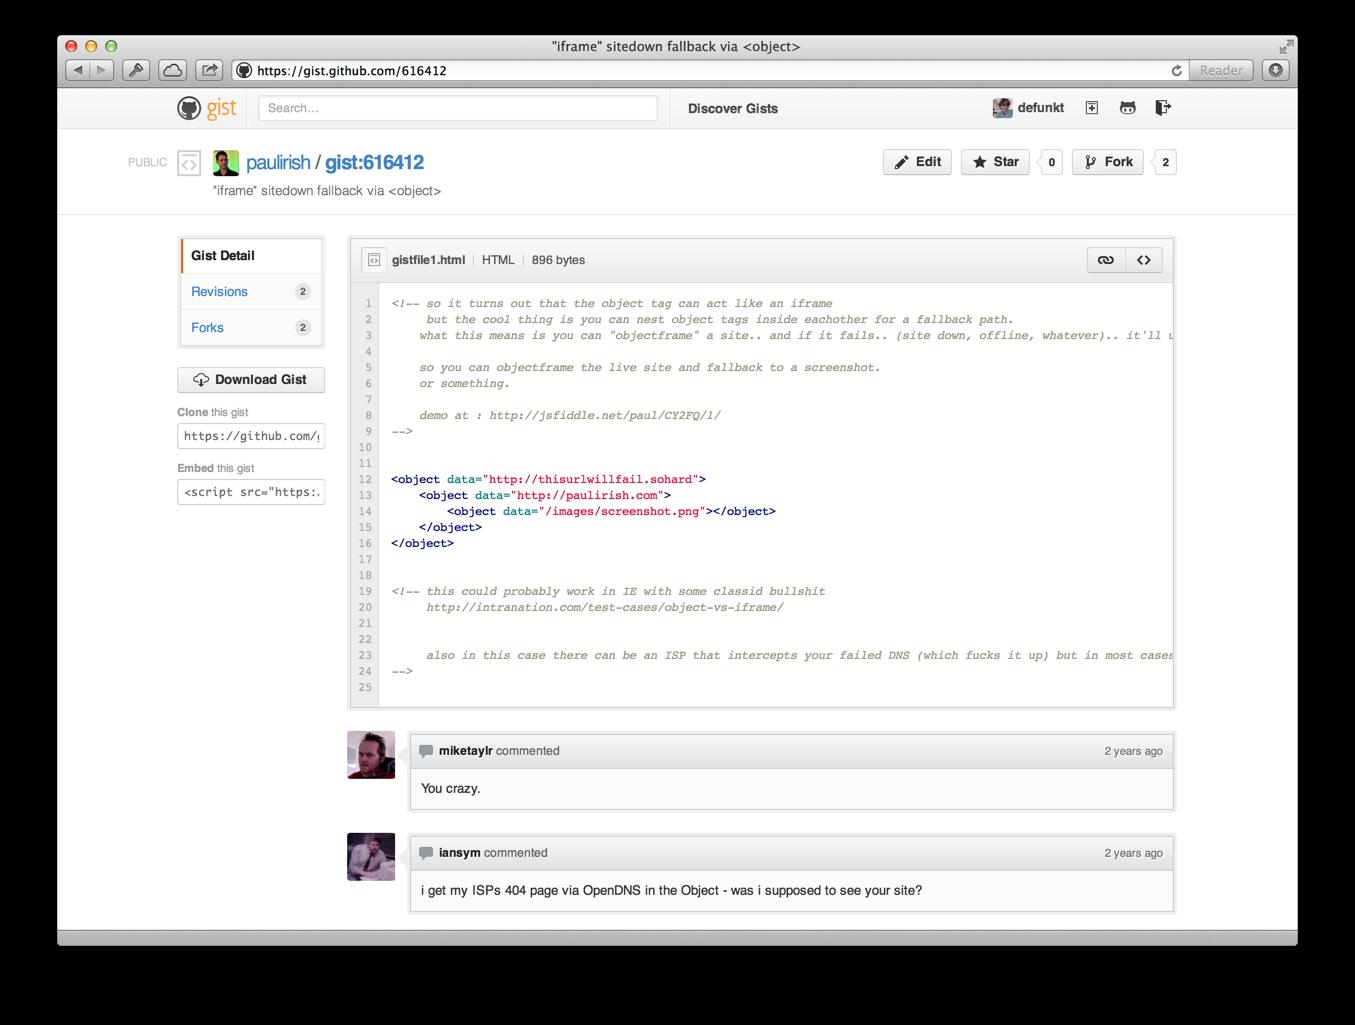 Welcome to a New Gist - The GitHub Blog